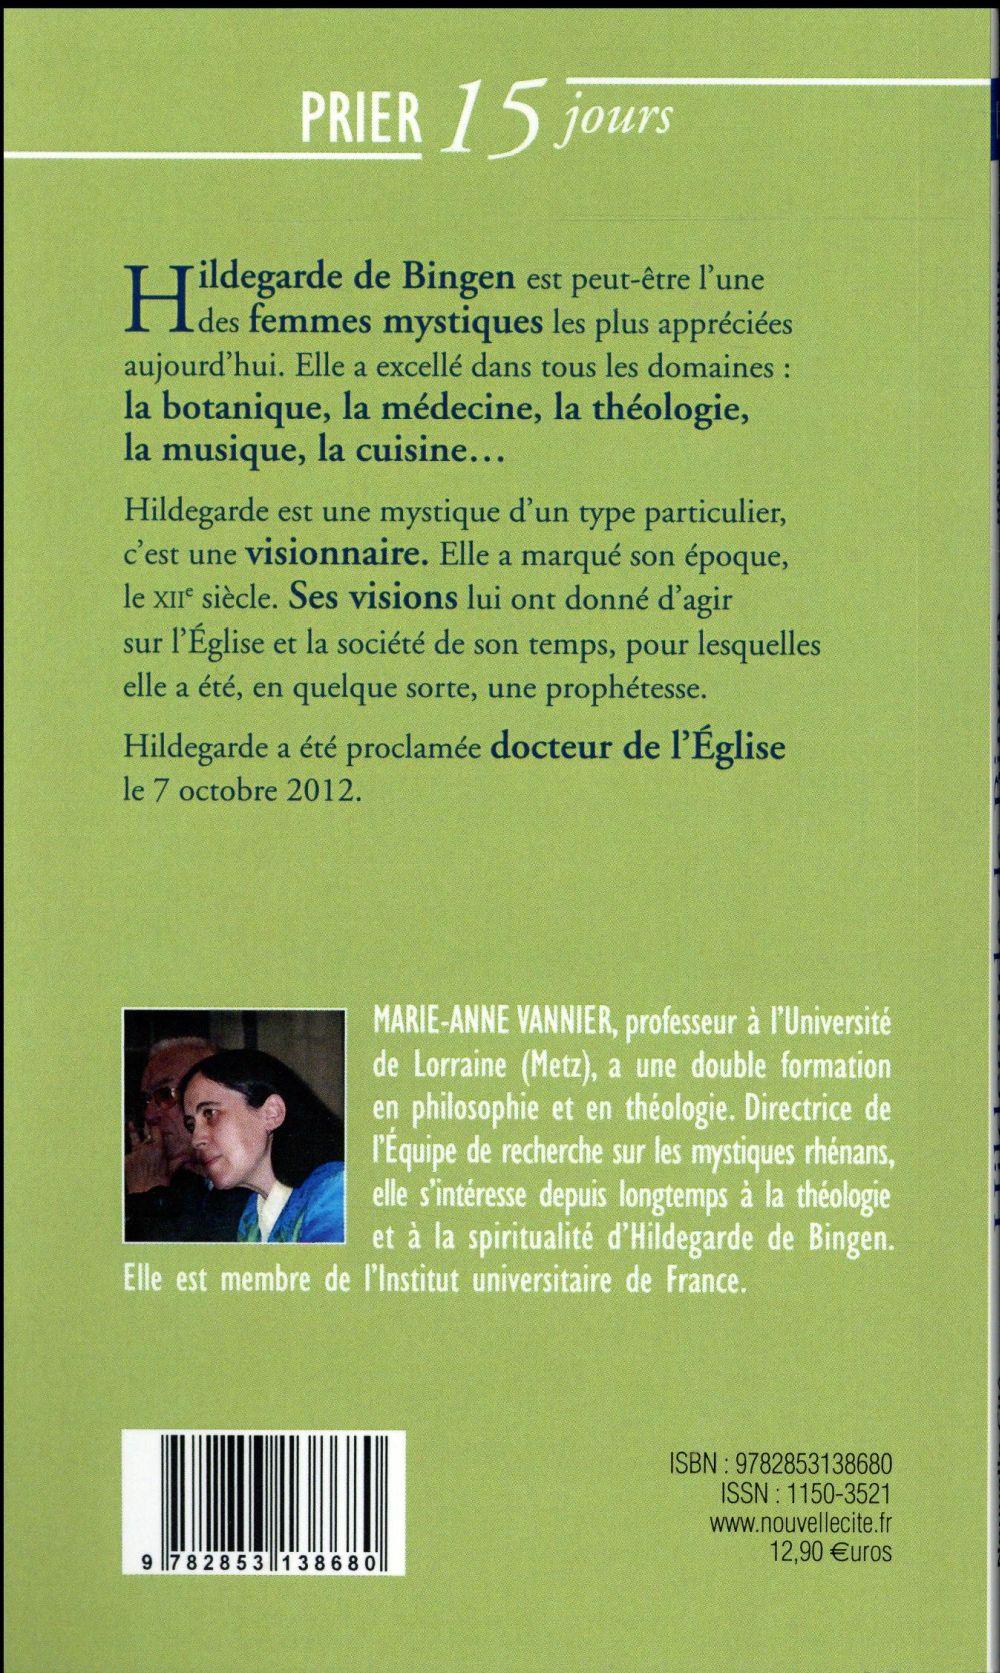 Prier 15 jours avec... T.160 ; Hildegarde de Bingen